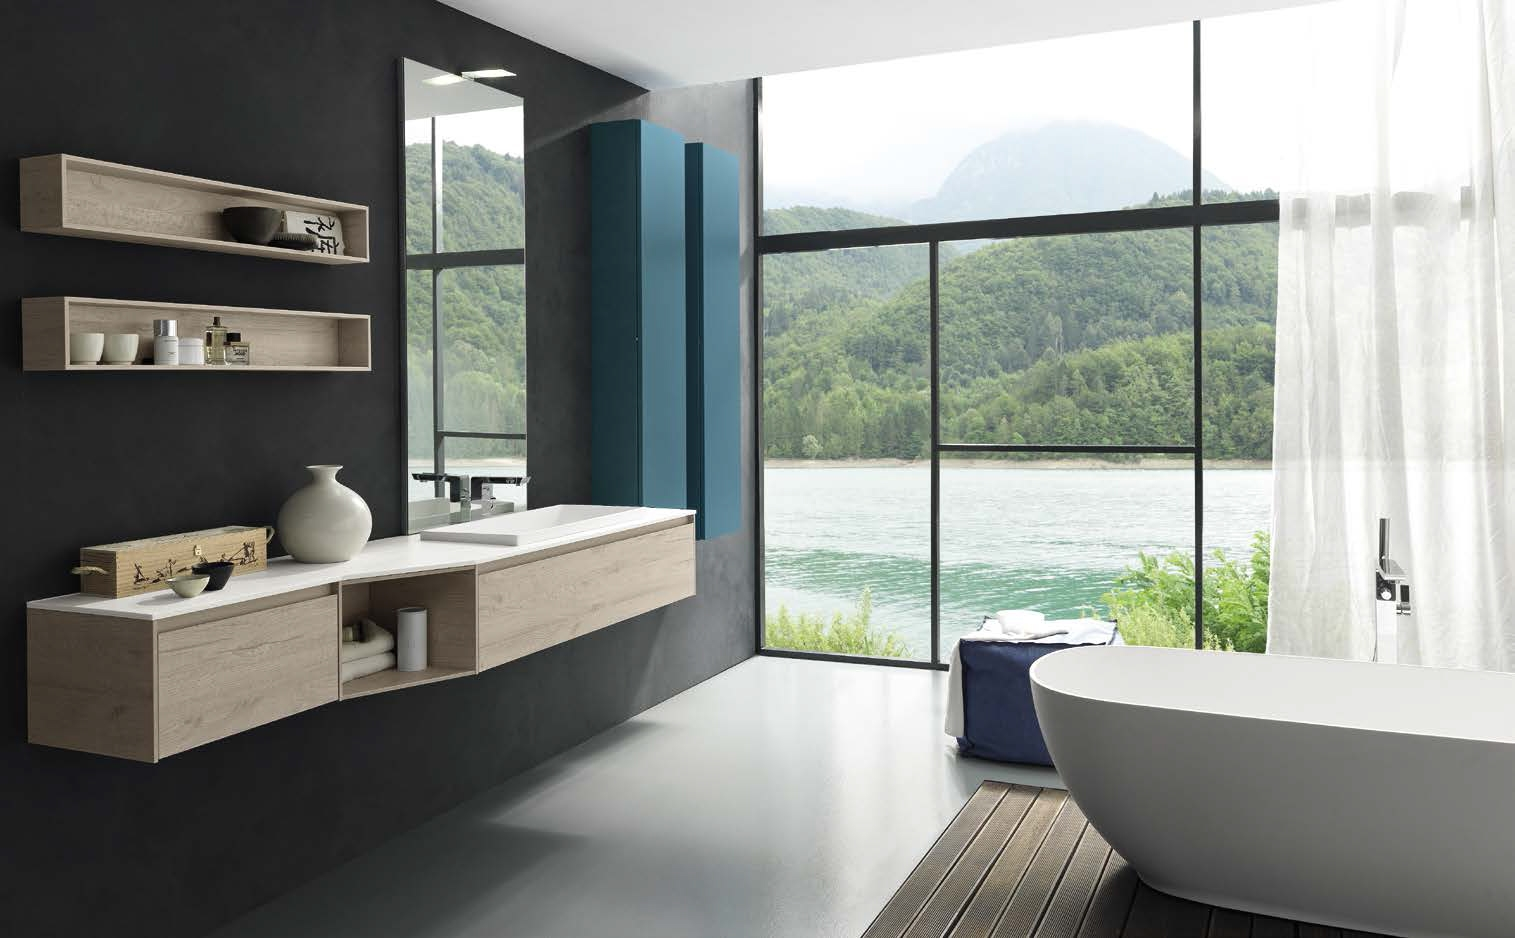 Meuble et vasque salle de bain pas cher valdiz for Meuble et vasque de salle de bain pas cher